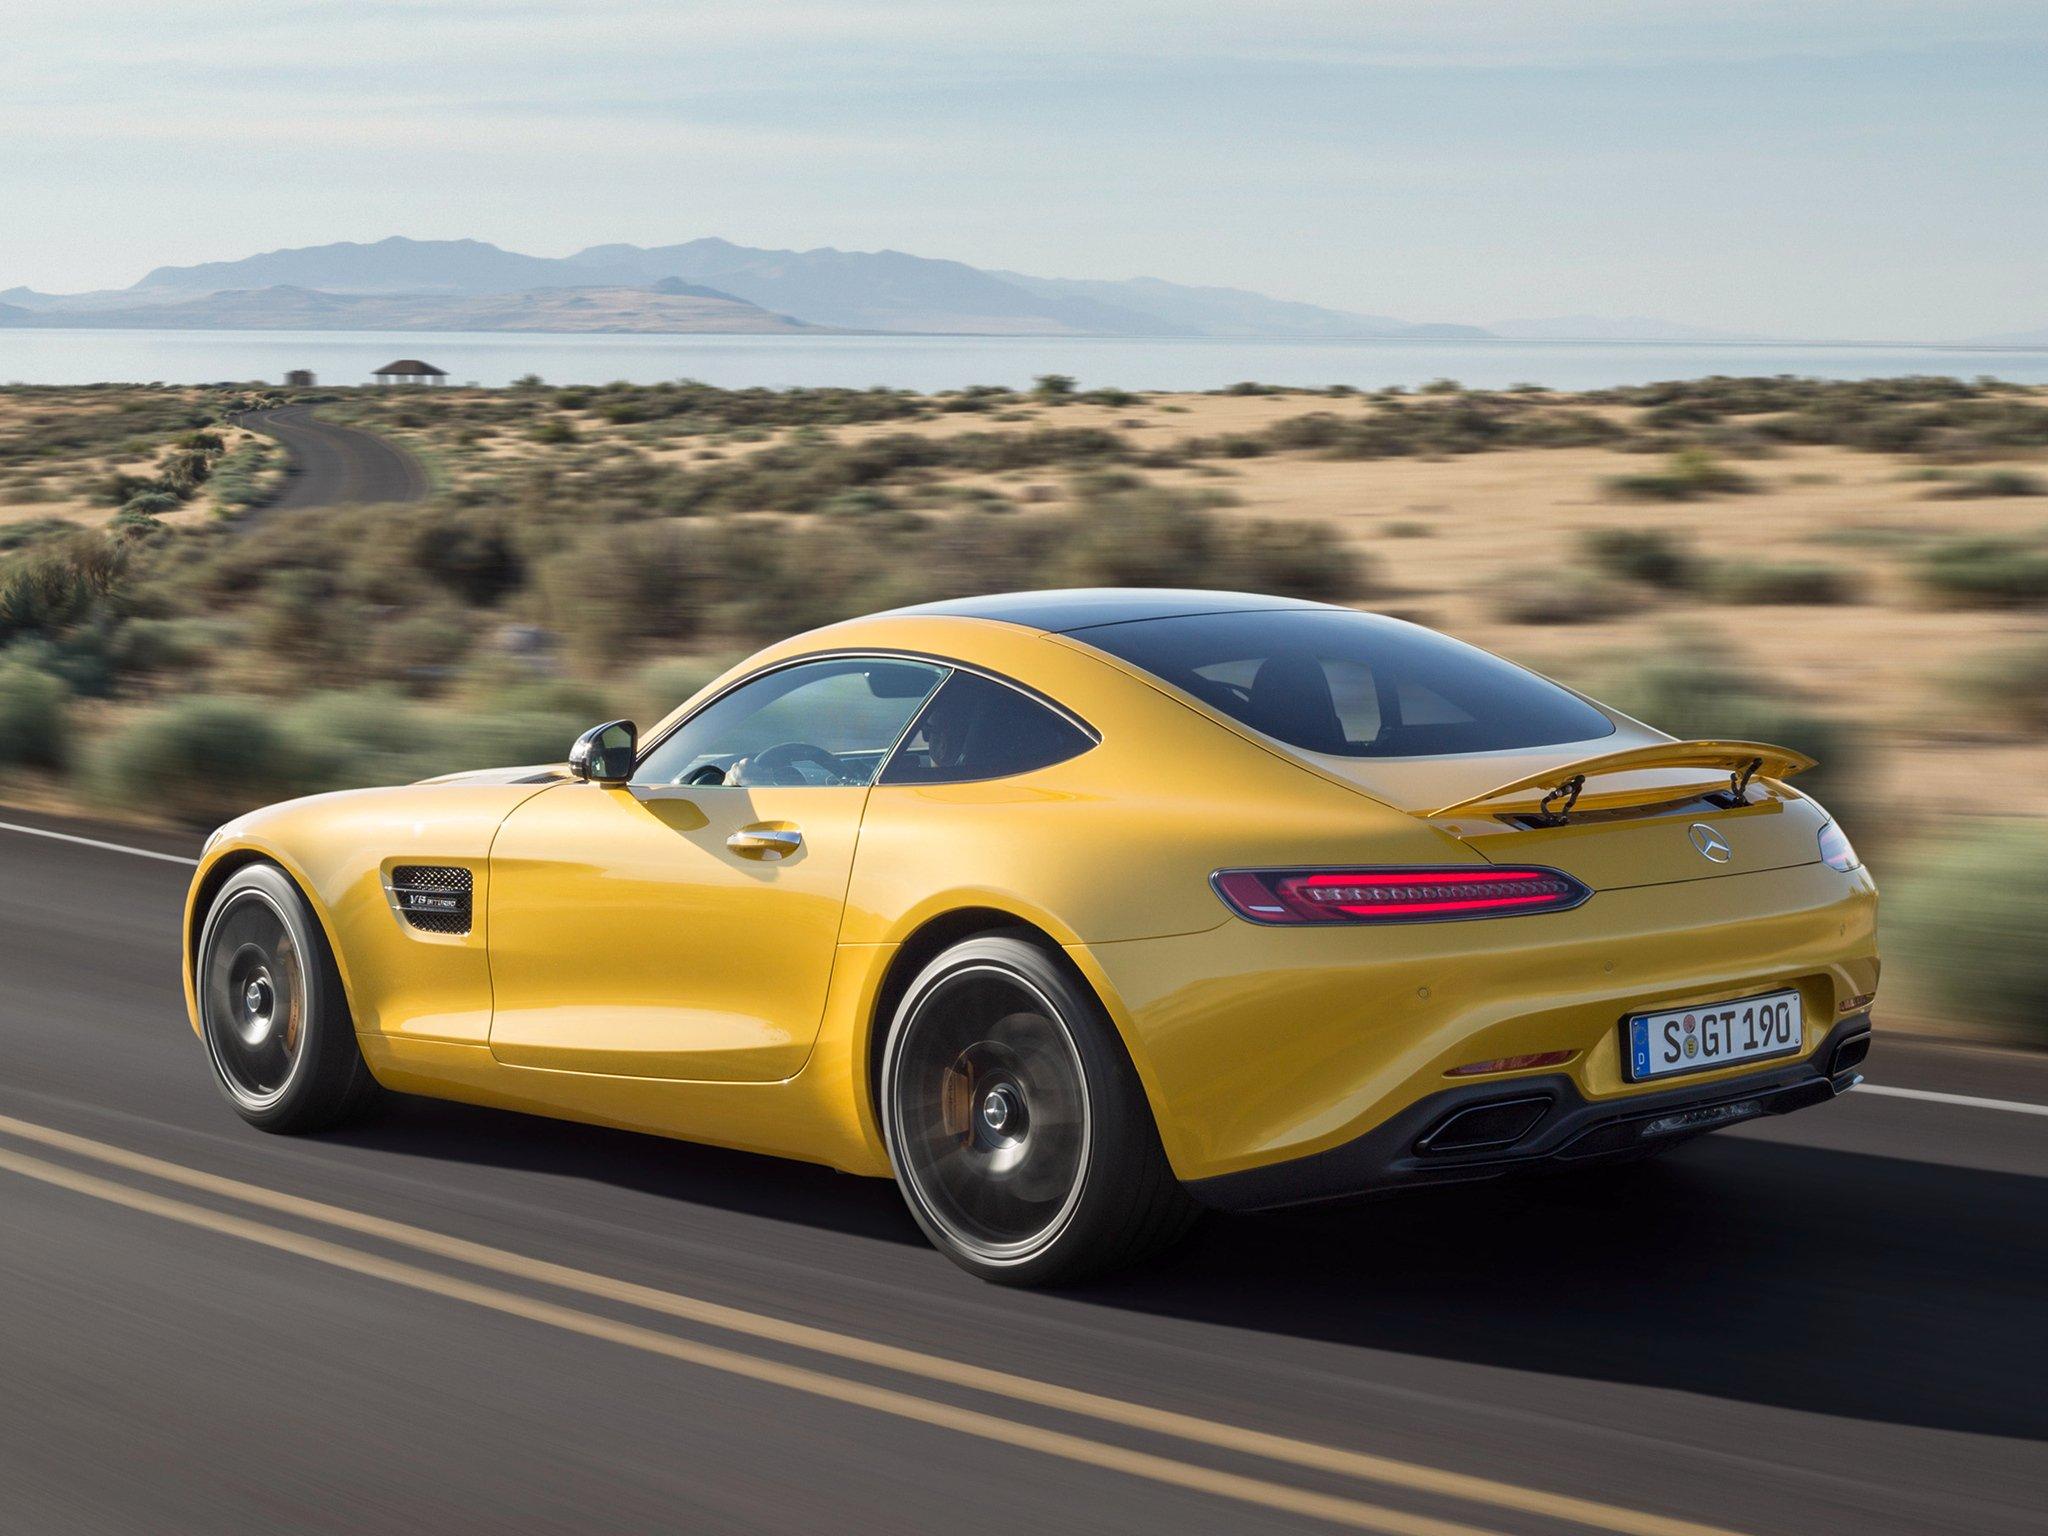 2014 mercedes benz amg gts g t supercar wallpaper for Mercedes benz gts price